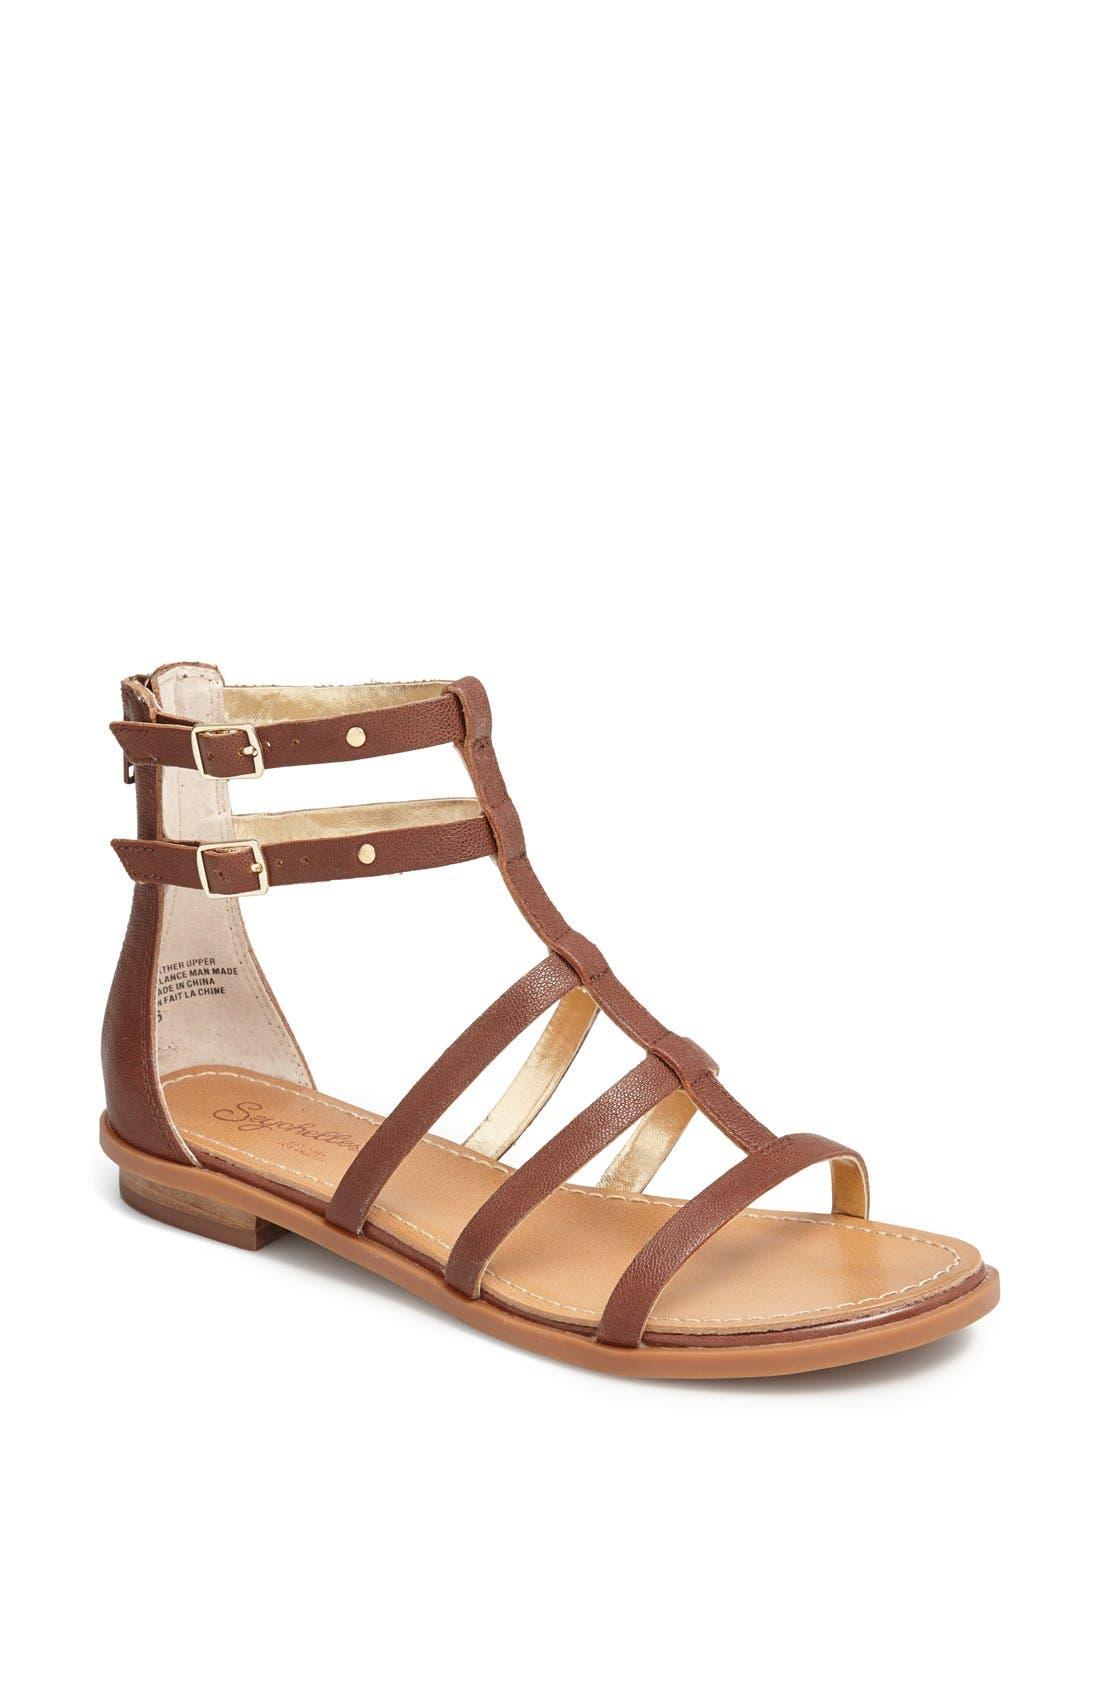 Alternate Image 1 Selected - Seychelles 'Aim High' Gladiator Sandal